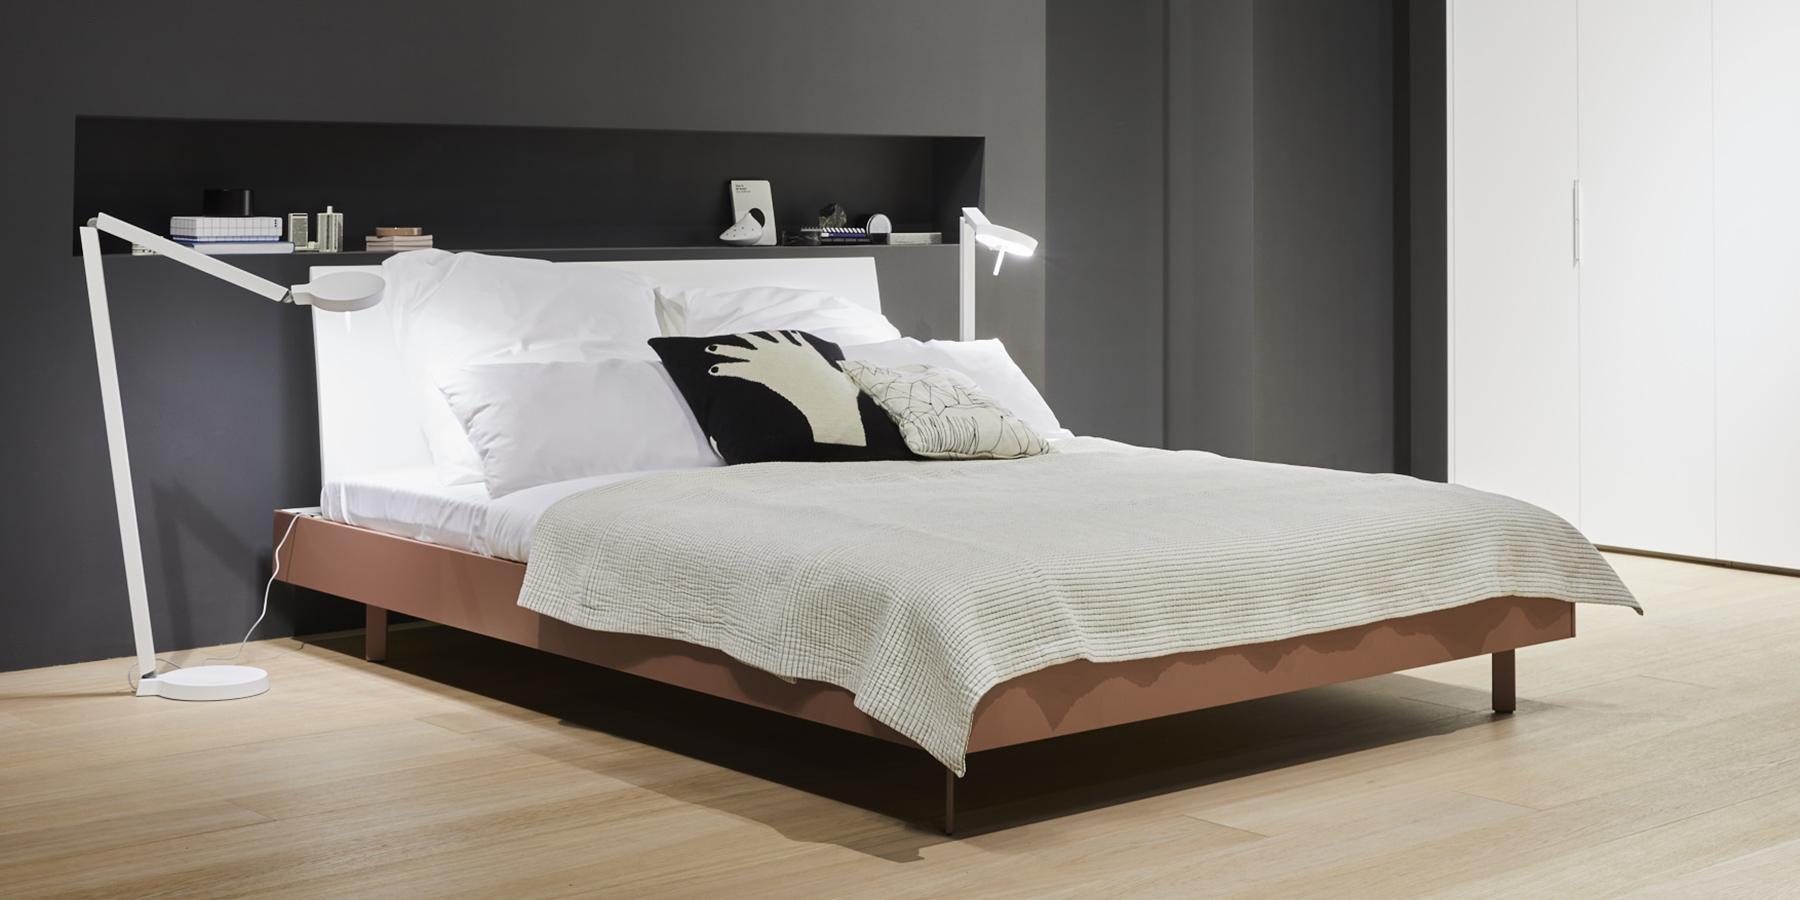 sch ner allesk nner bett izzy von interl bke im cor interl bke studio in n rnberg. Black Bedroom Furniture Sets. Home Design Ideas